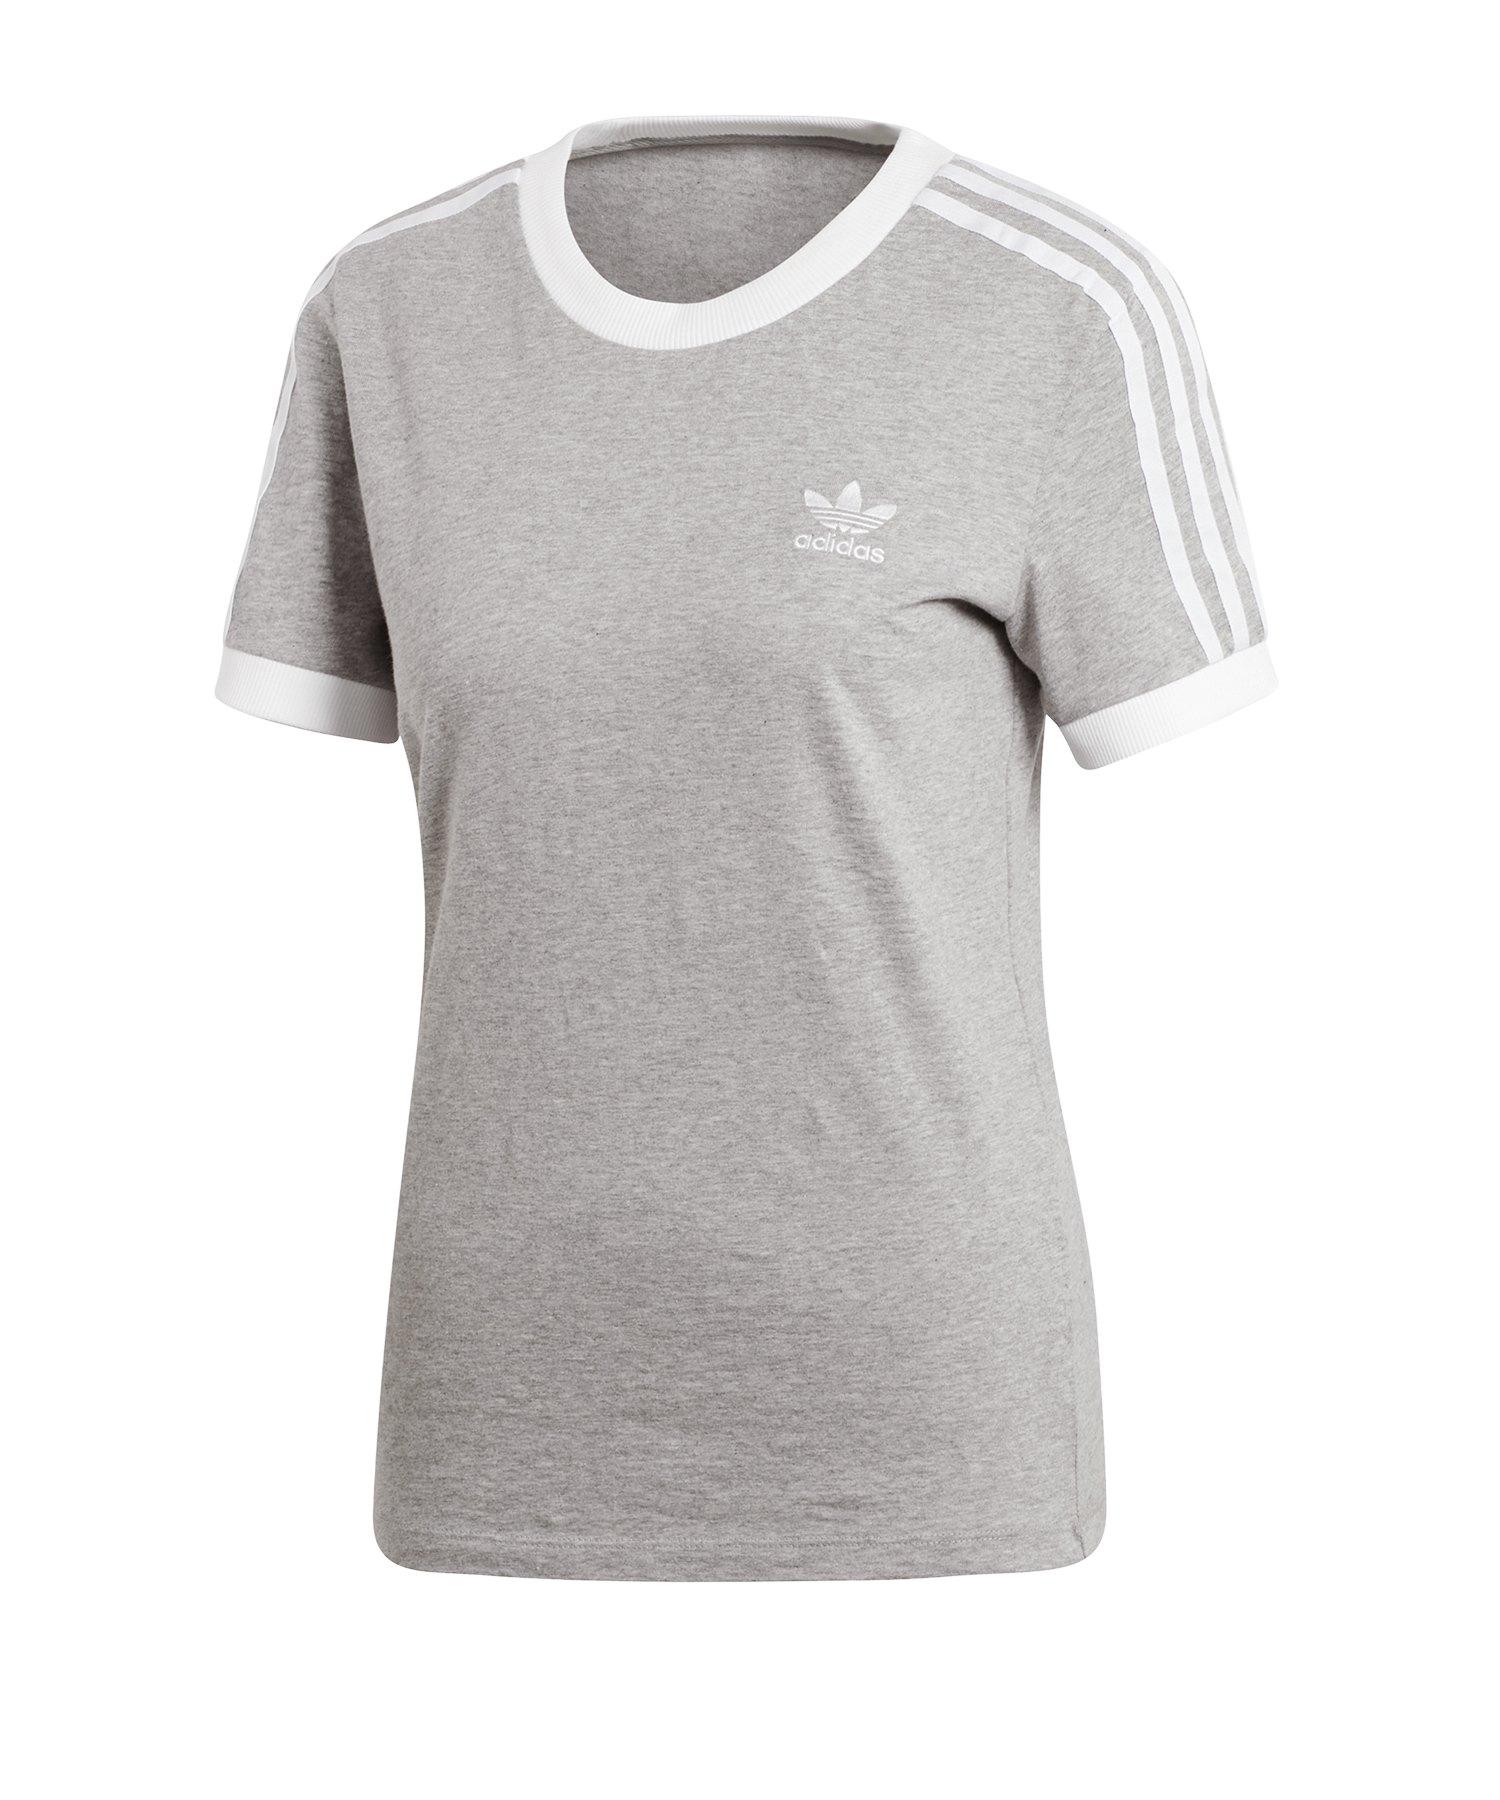 Adidas 3 Stripes T Shirt ab 14,40 €   Preisvergleich bei